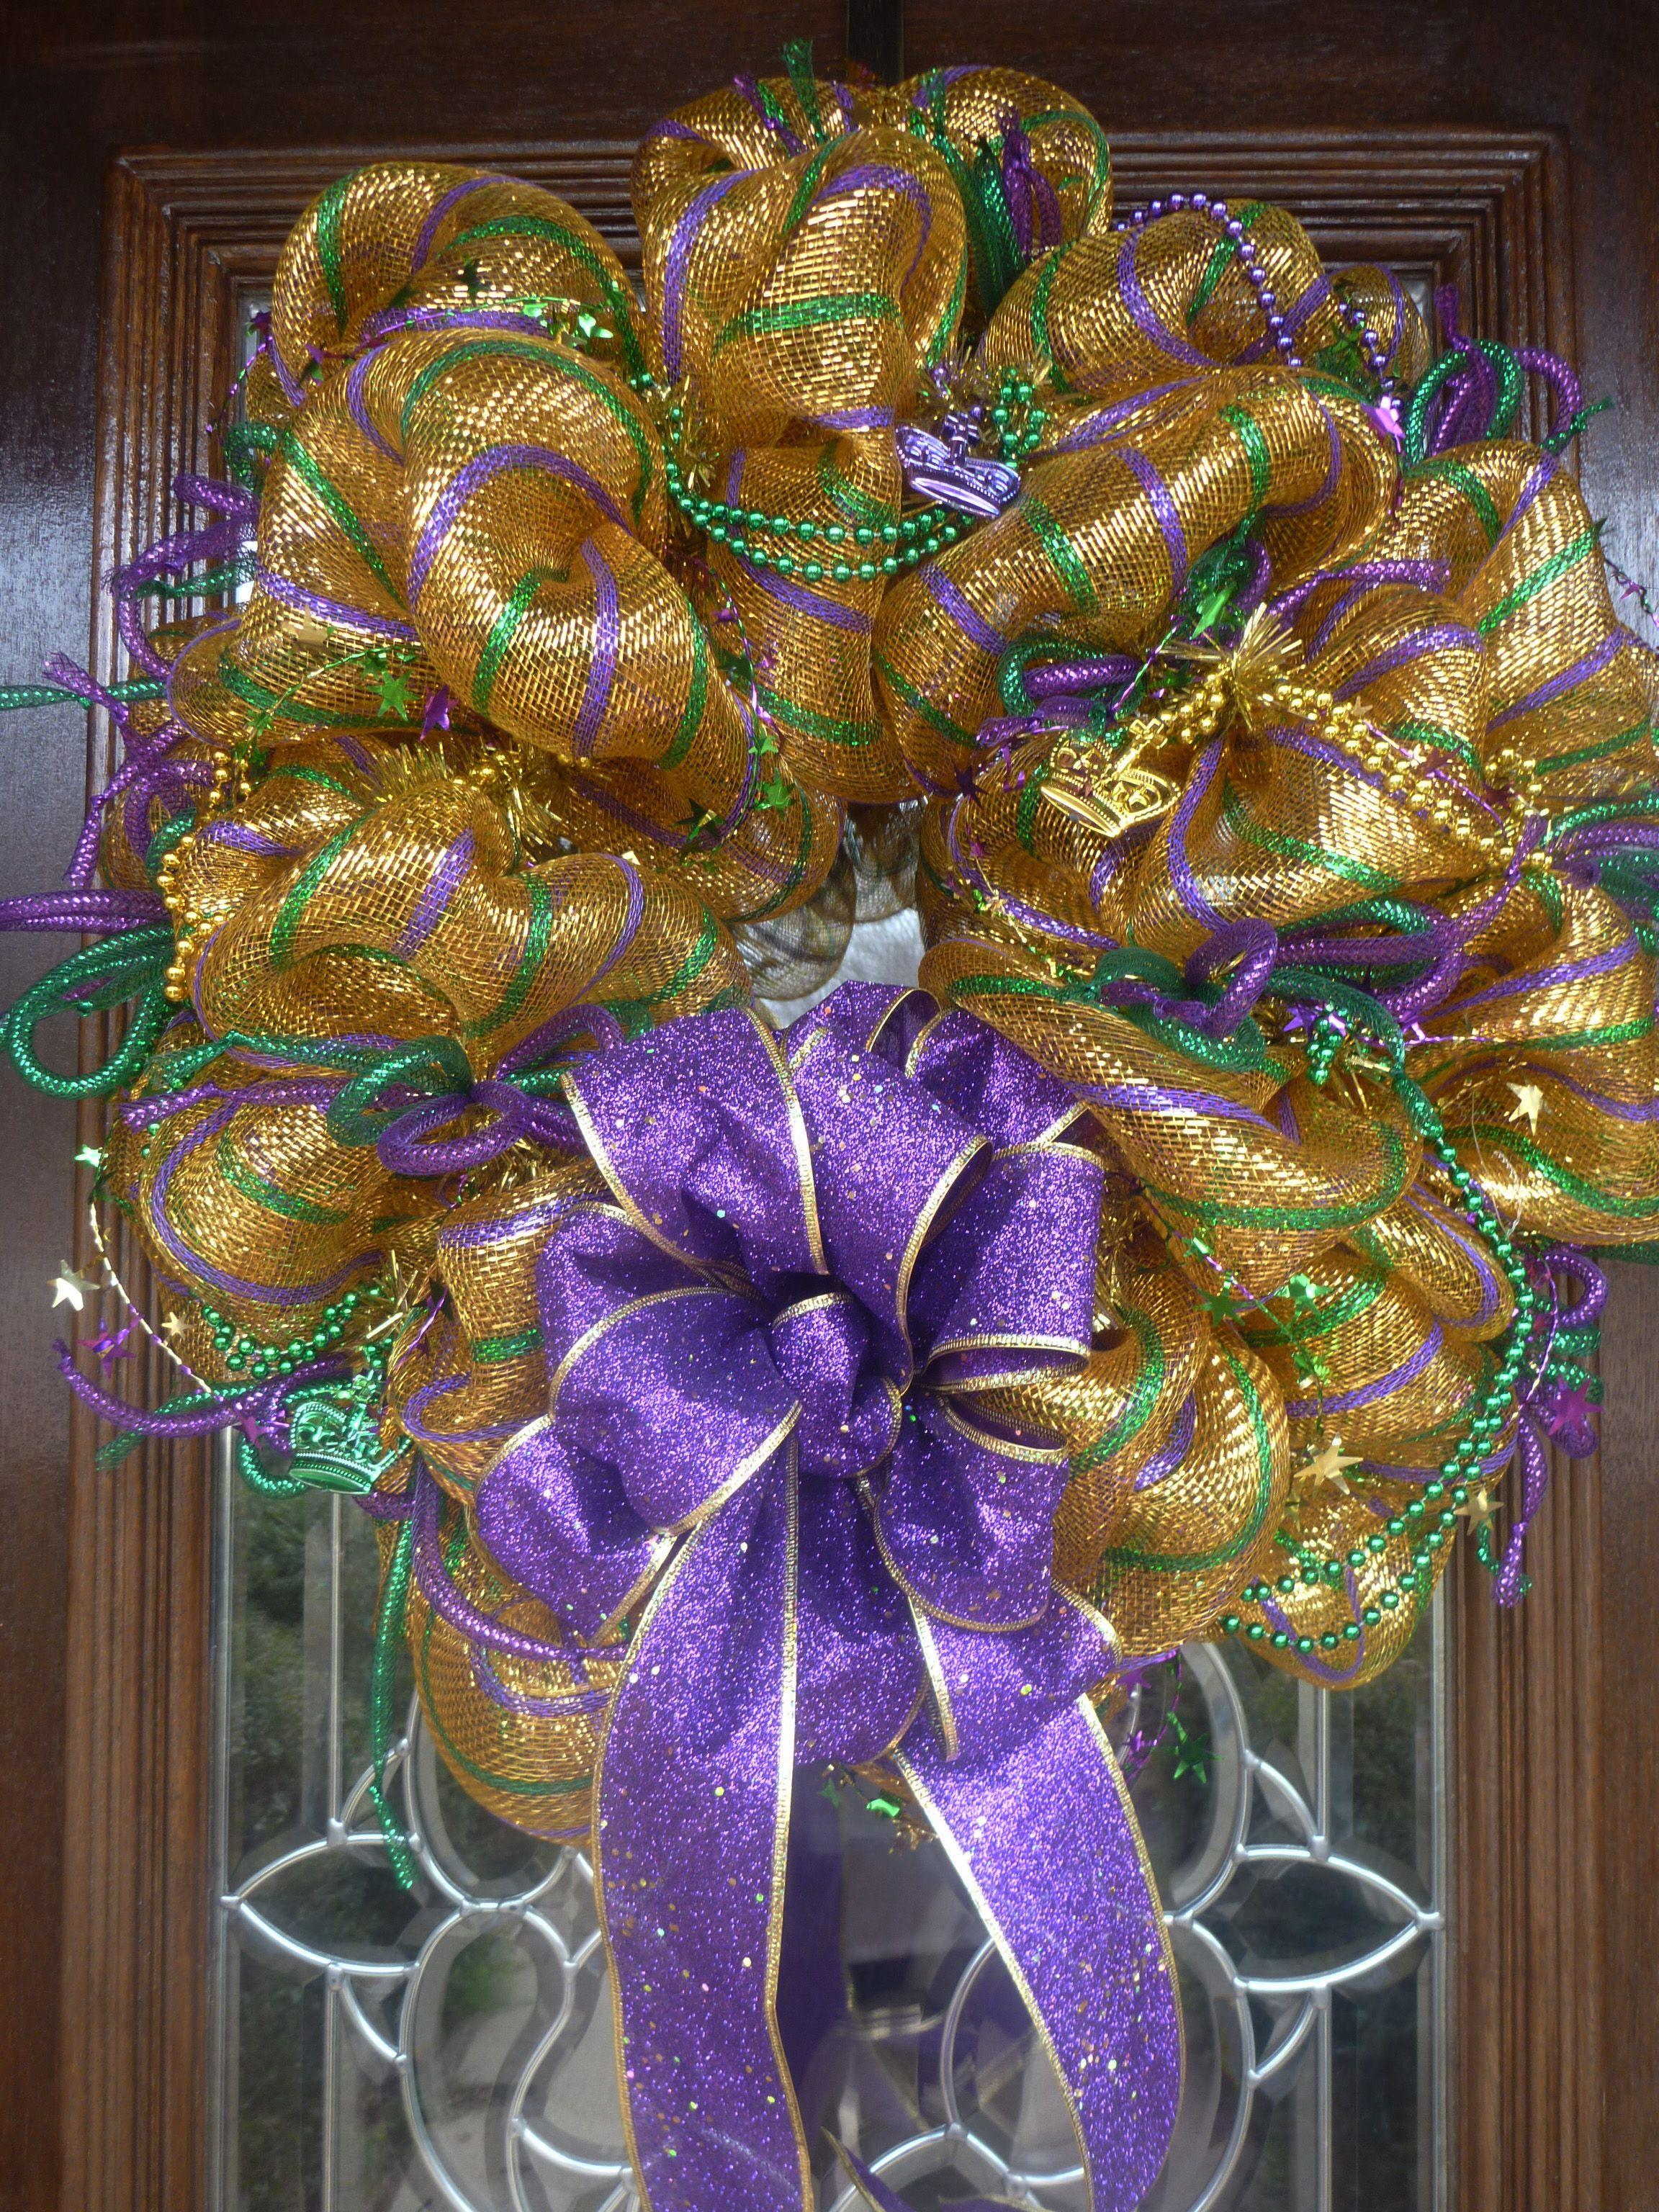 Get Ready For Mardi Gras Deco Mesh Wreath Mardi Gras Decorations Mardi Gras Crafts Mardi Gras Wreath